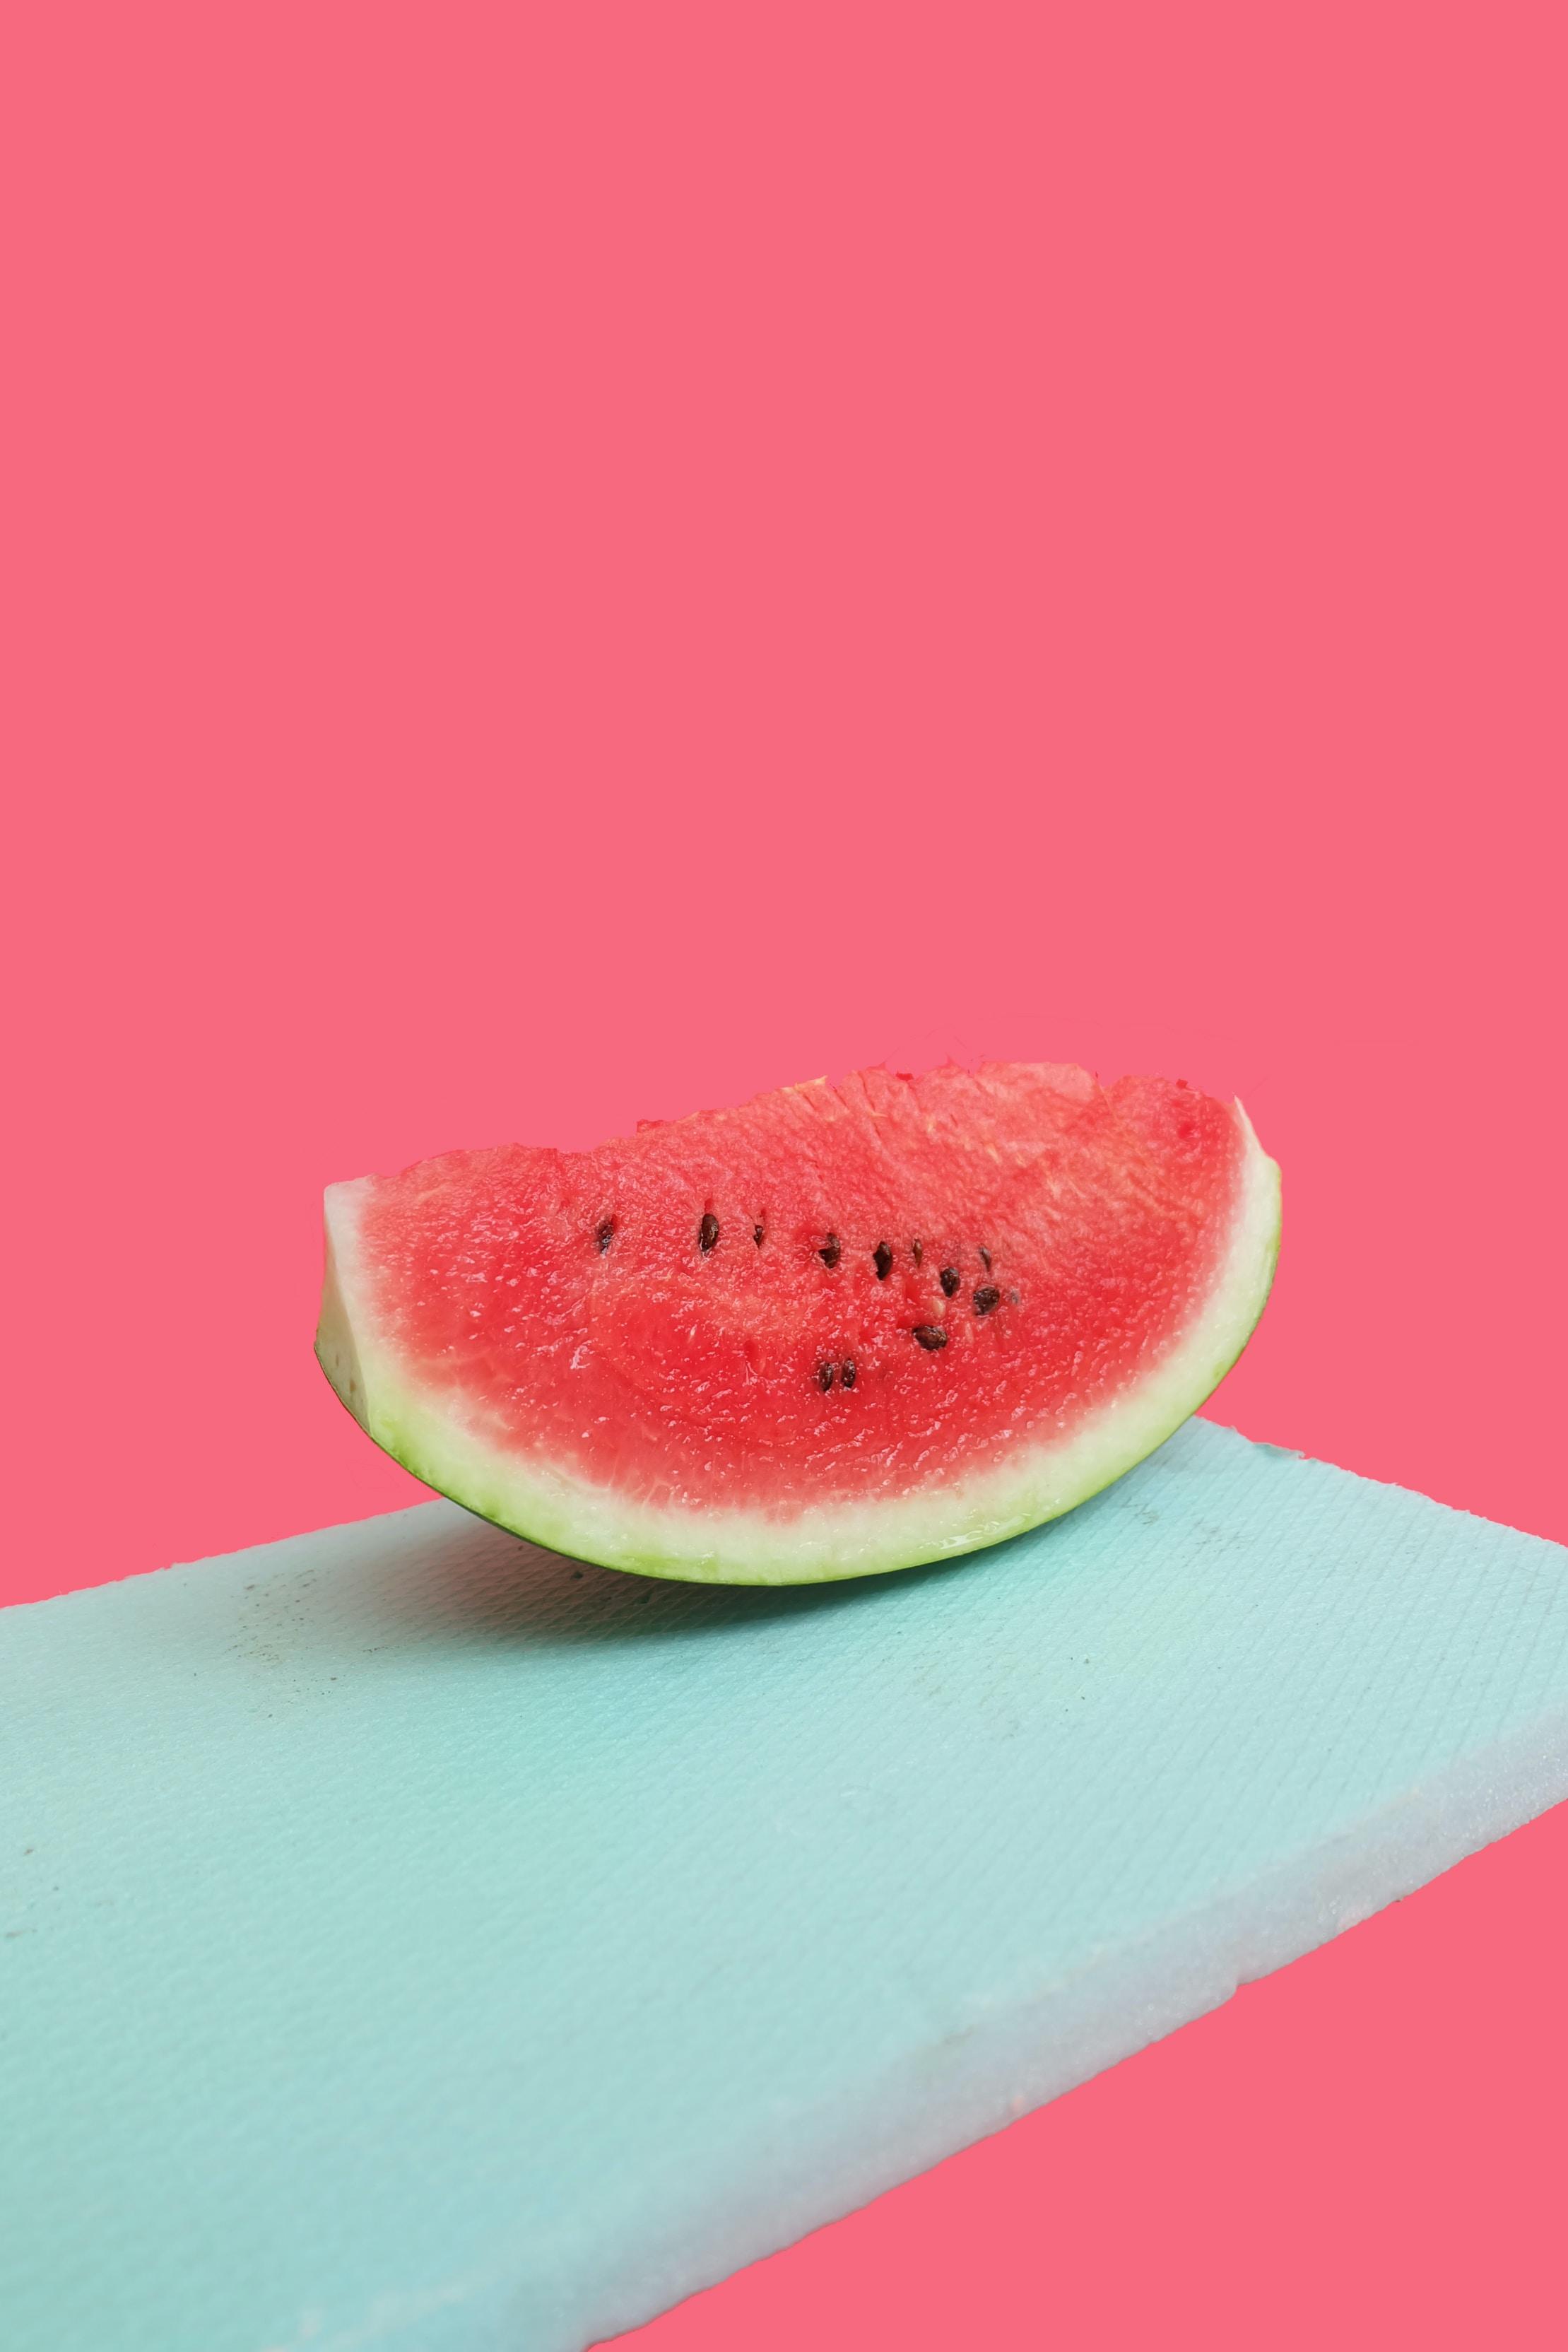 sliced watermelon